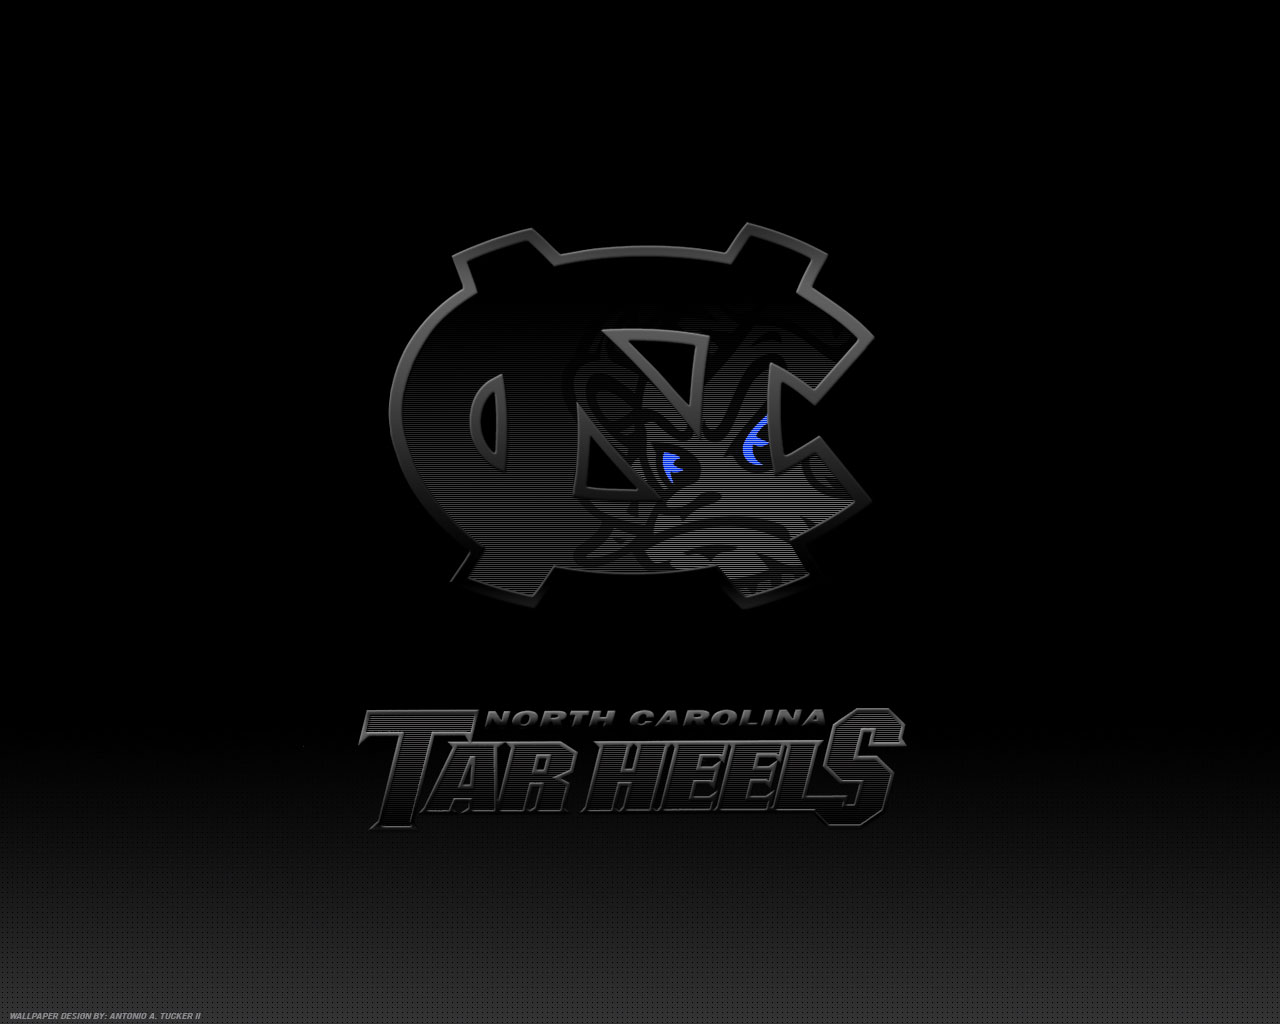 UNC Tar Heels Logo background wallpaper for desktop or web site ...